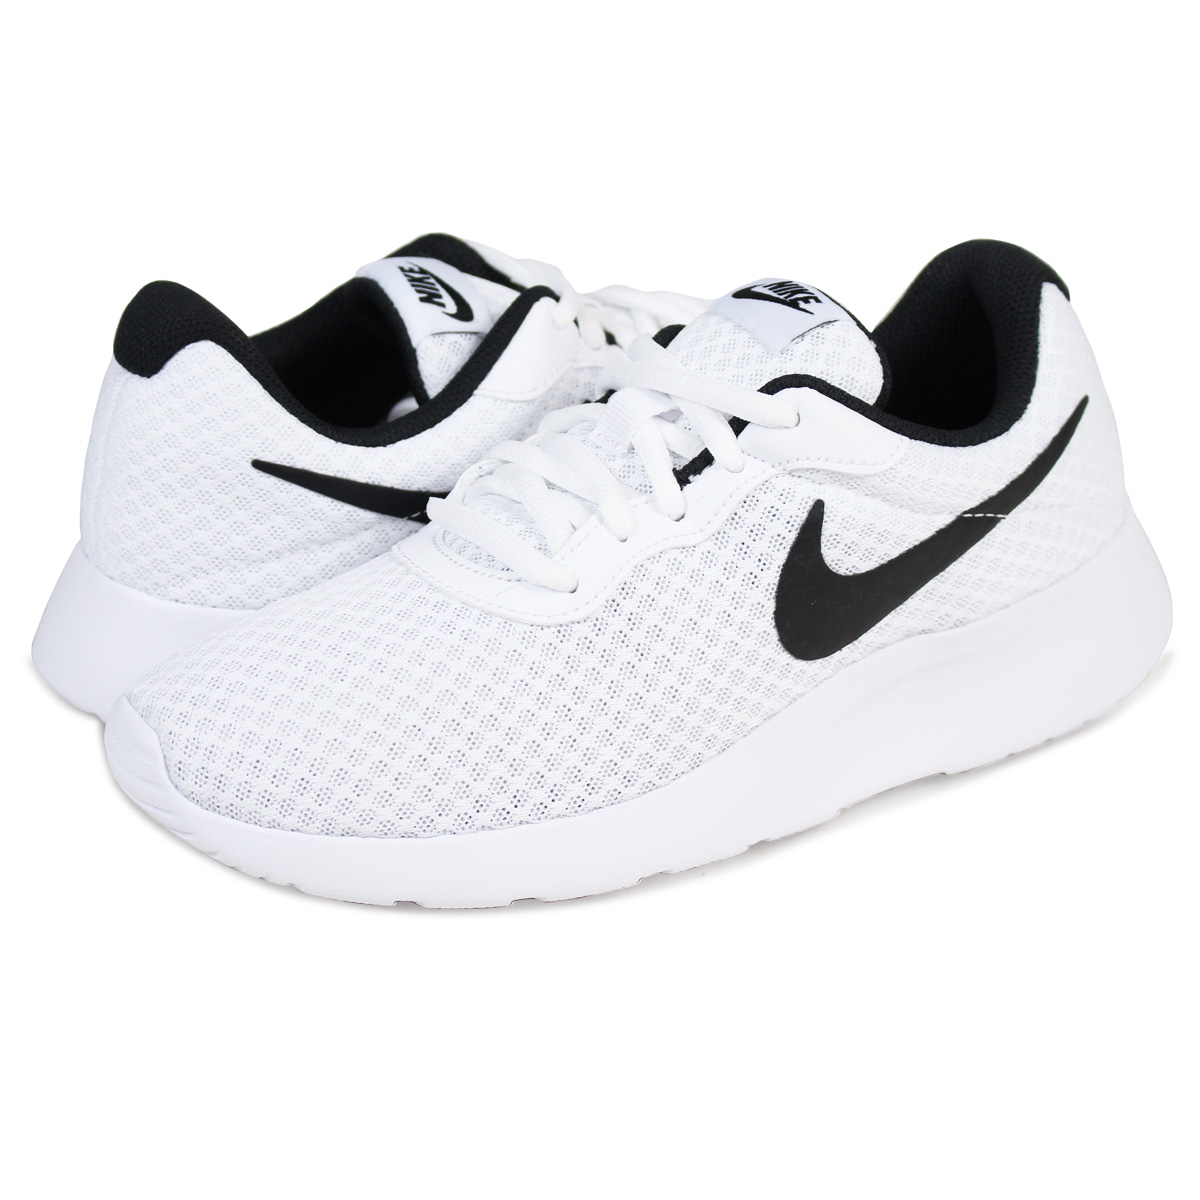 Nike Tanjun White Black Women Size Running Shoes New In Box Original 812655 100